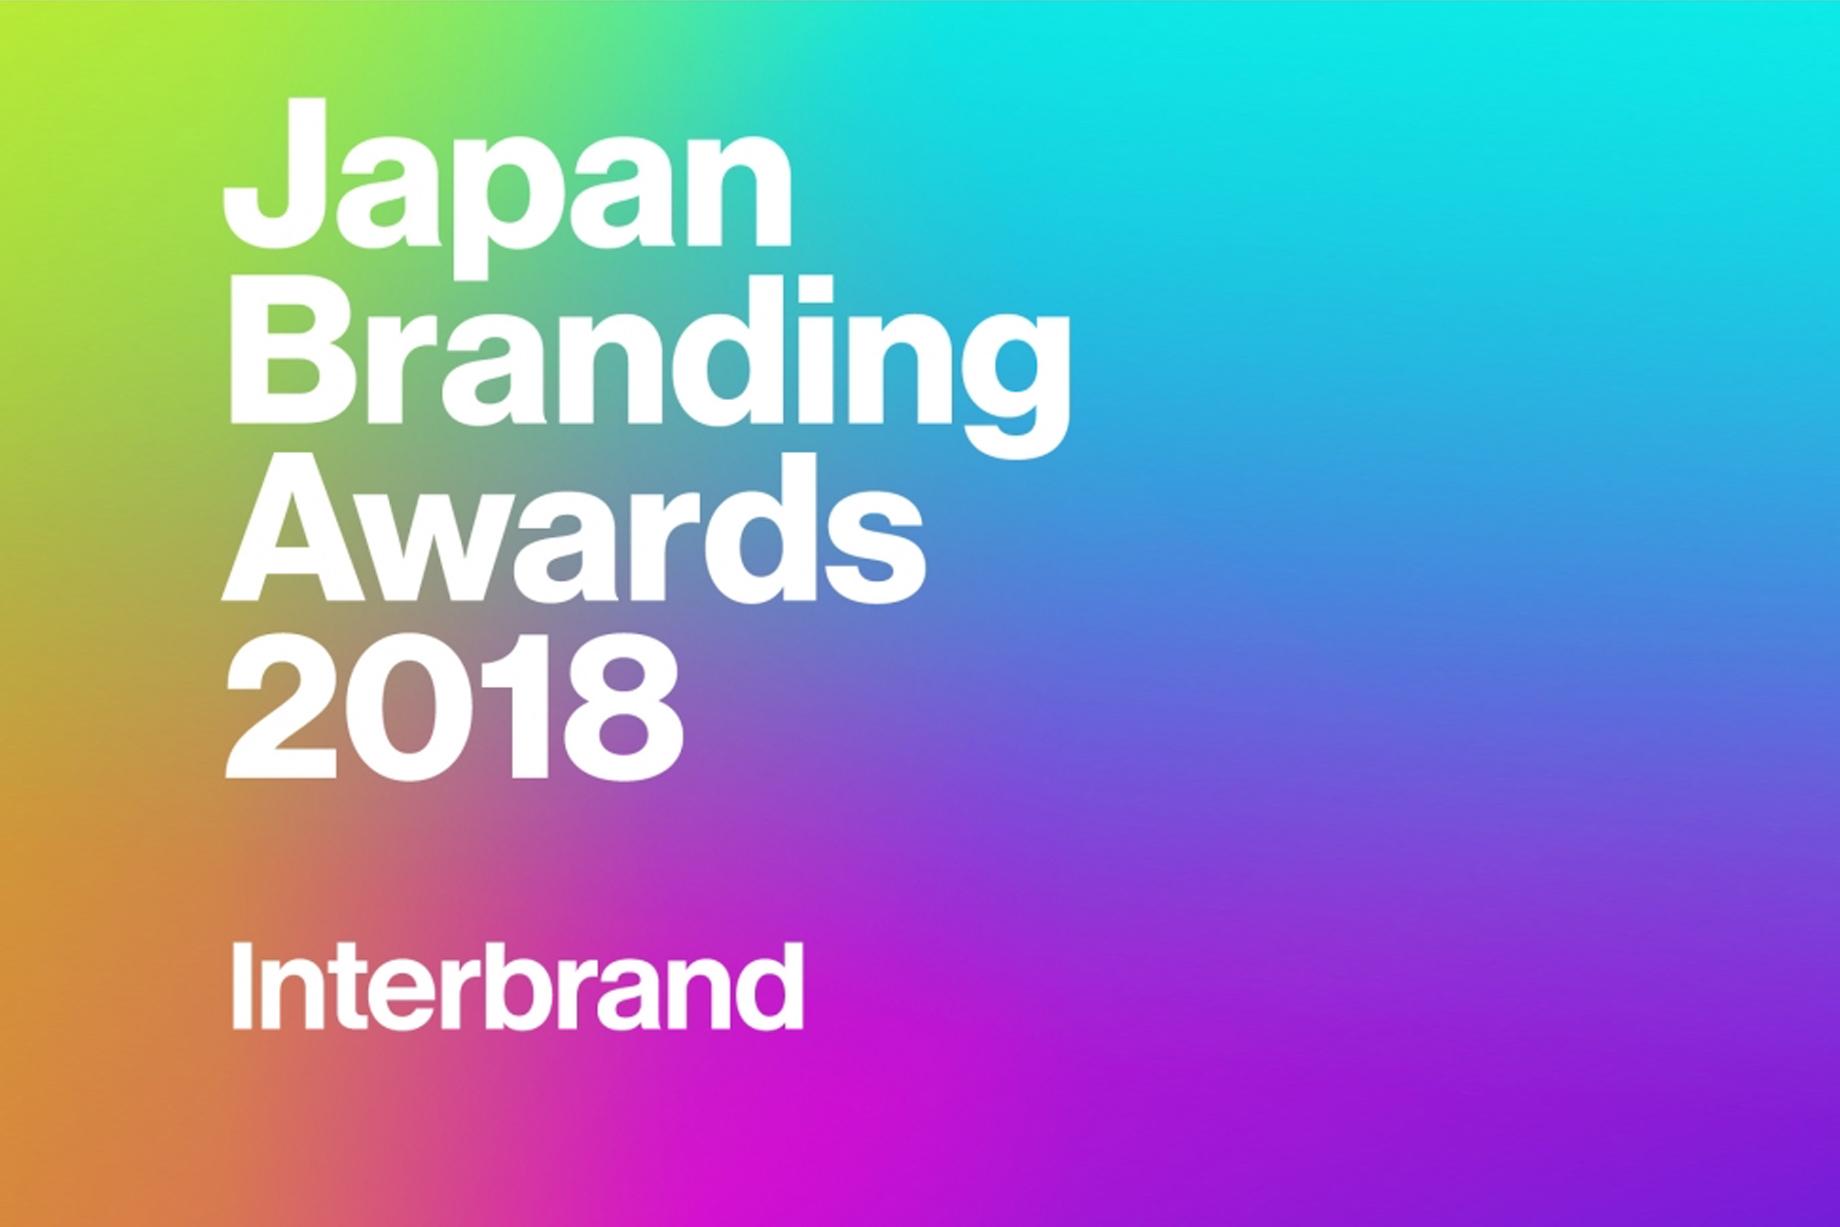 Rising Stars Award WINNING! Japan Branding Awards 2018 by Interbrand